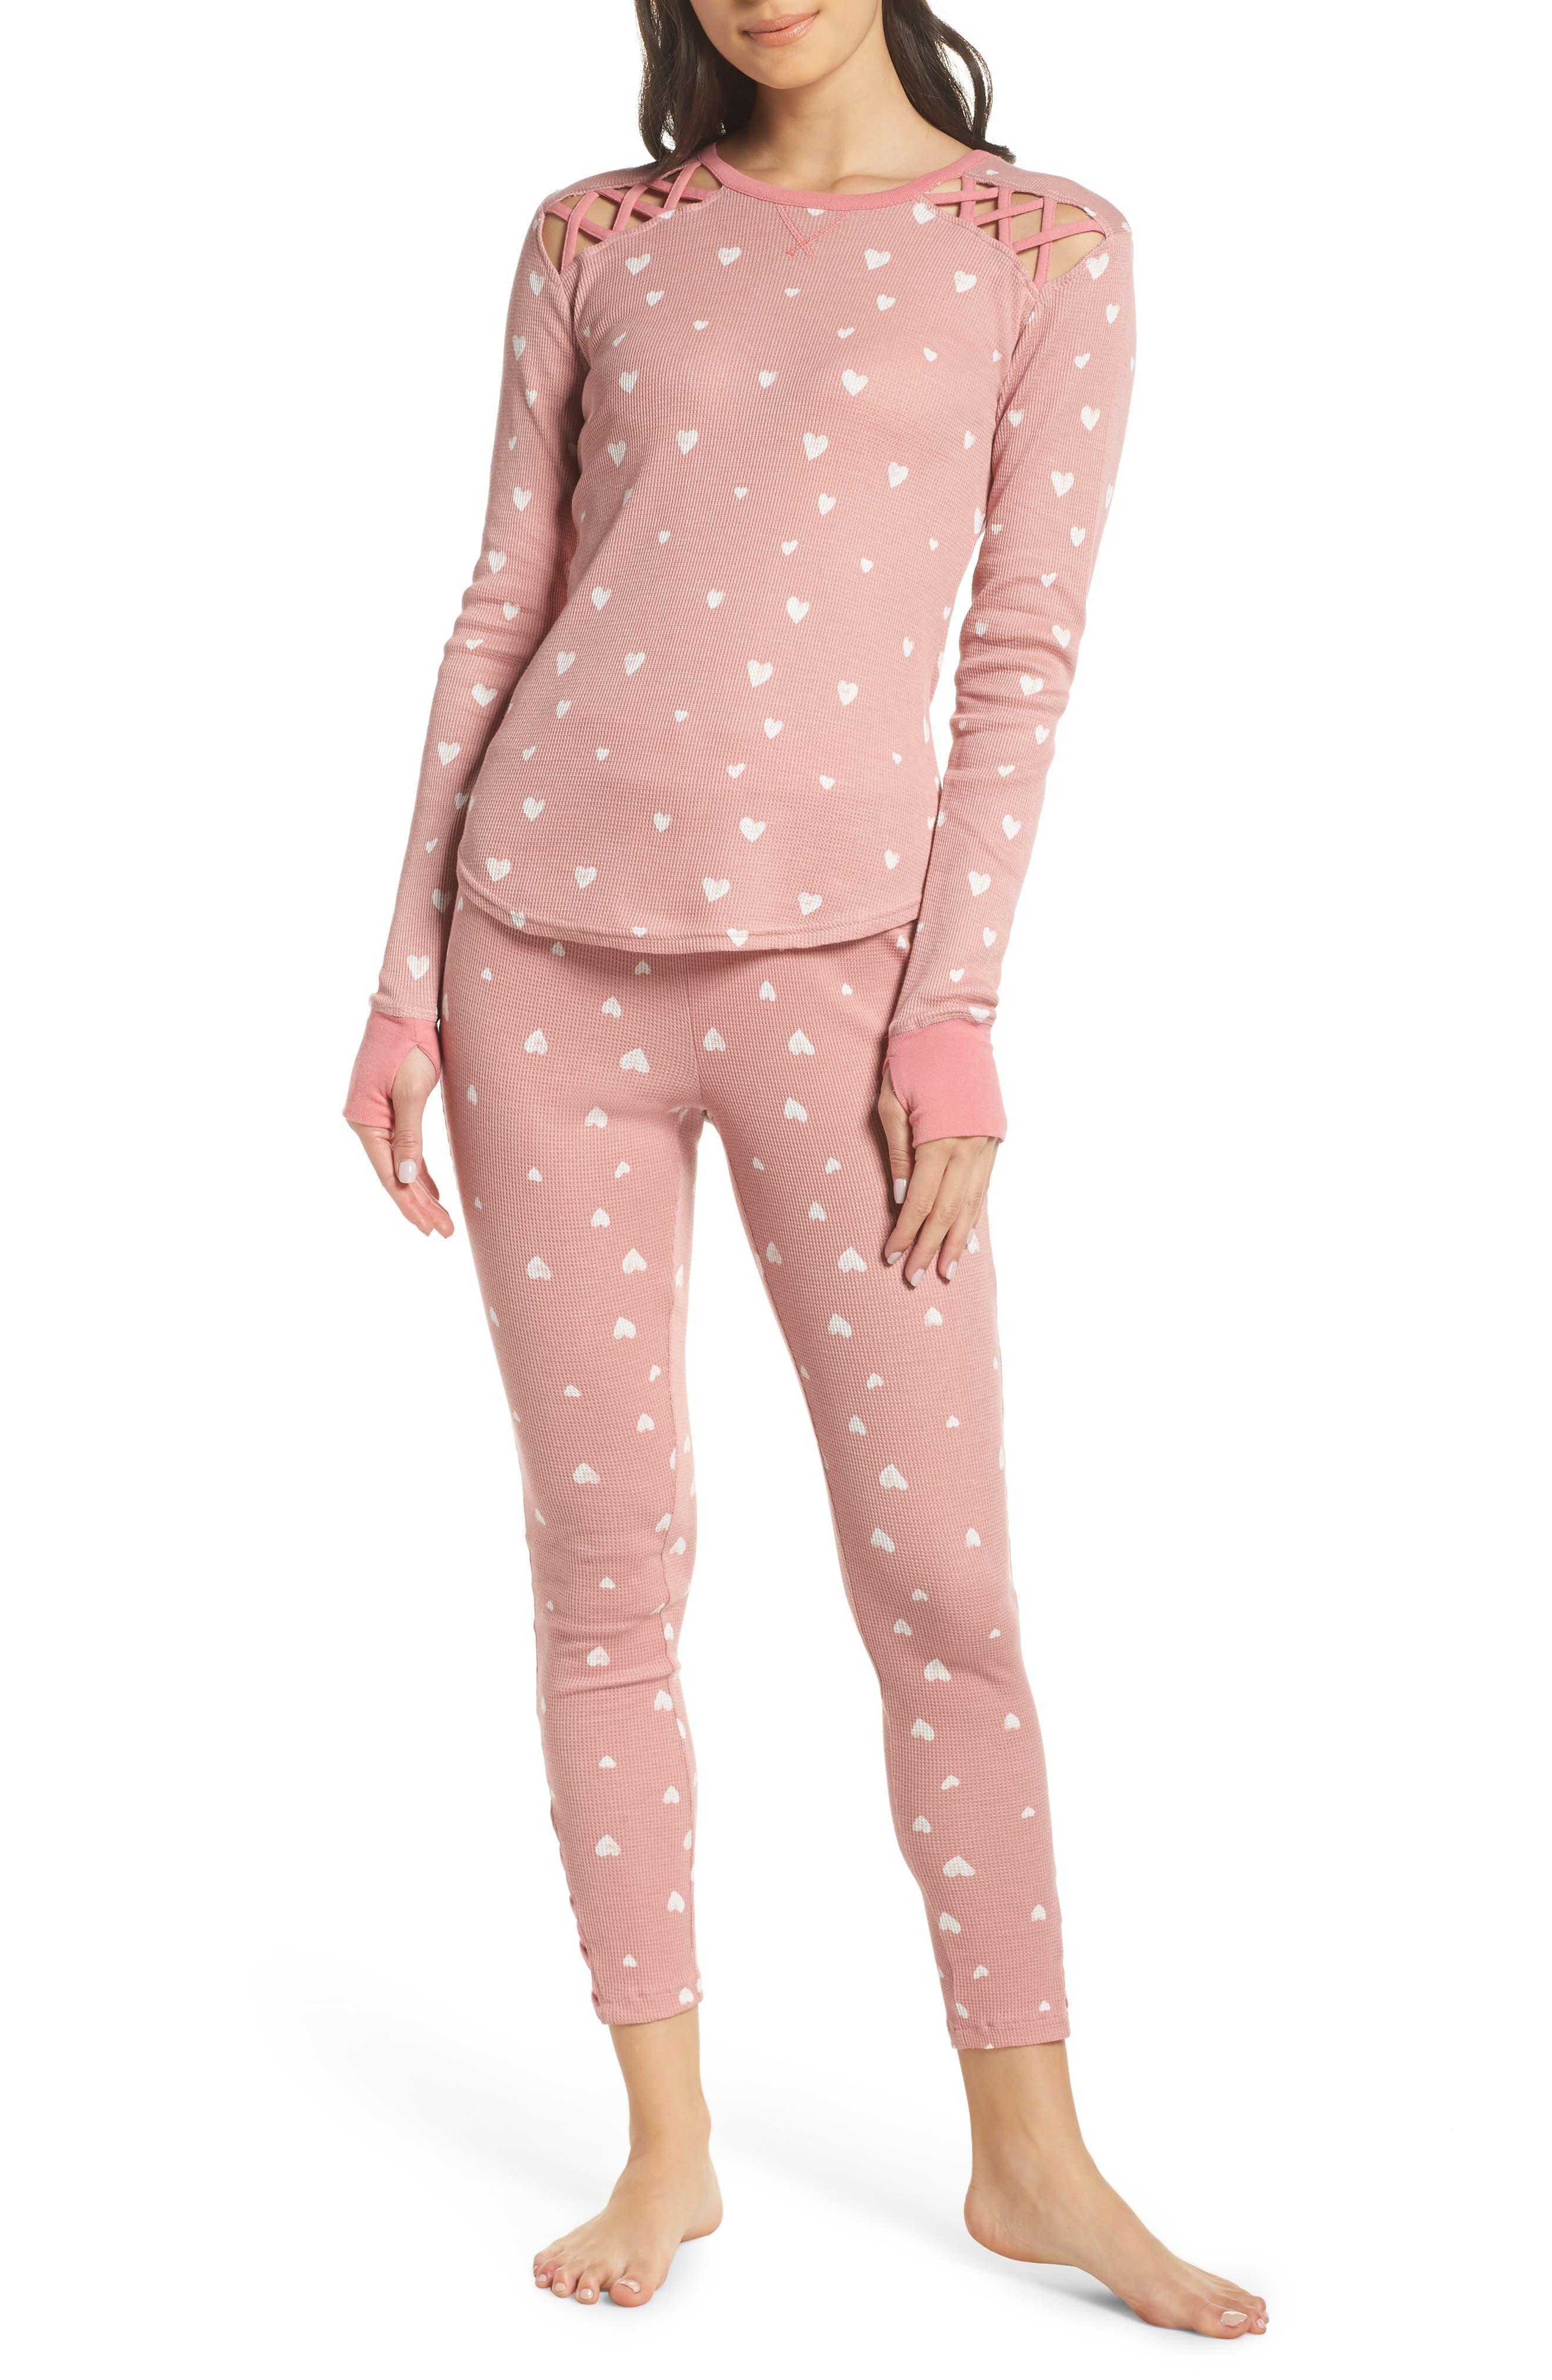 Retrospective Co. Thermal Pajamas, Pink